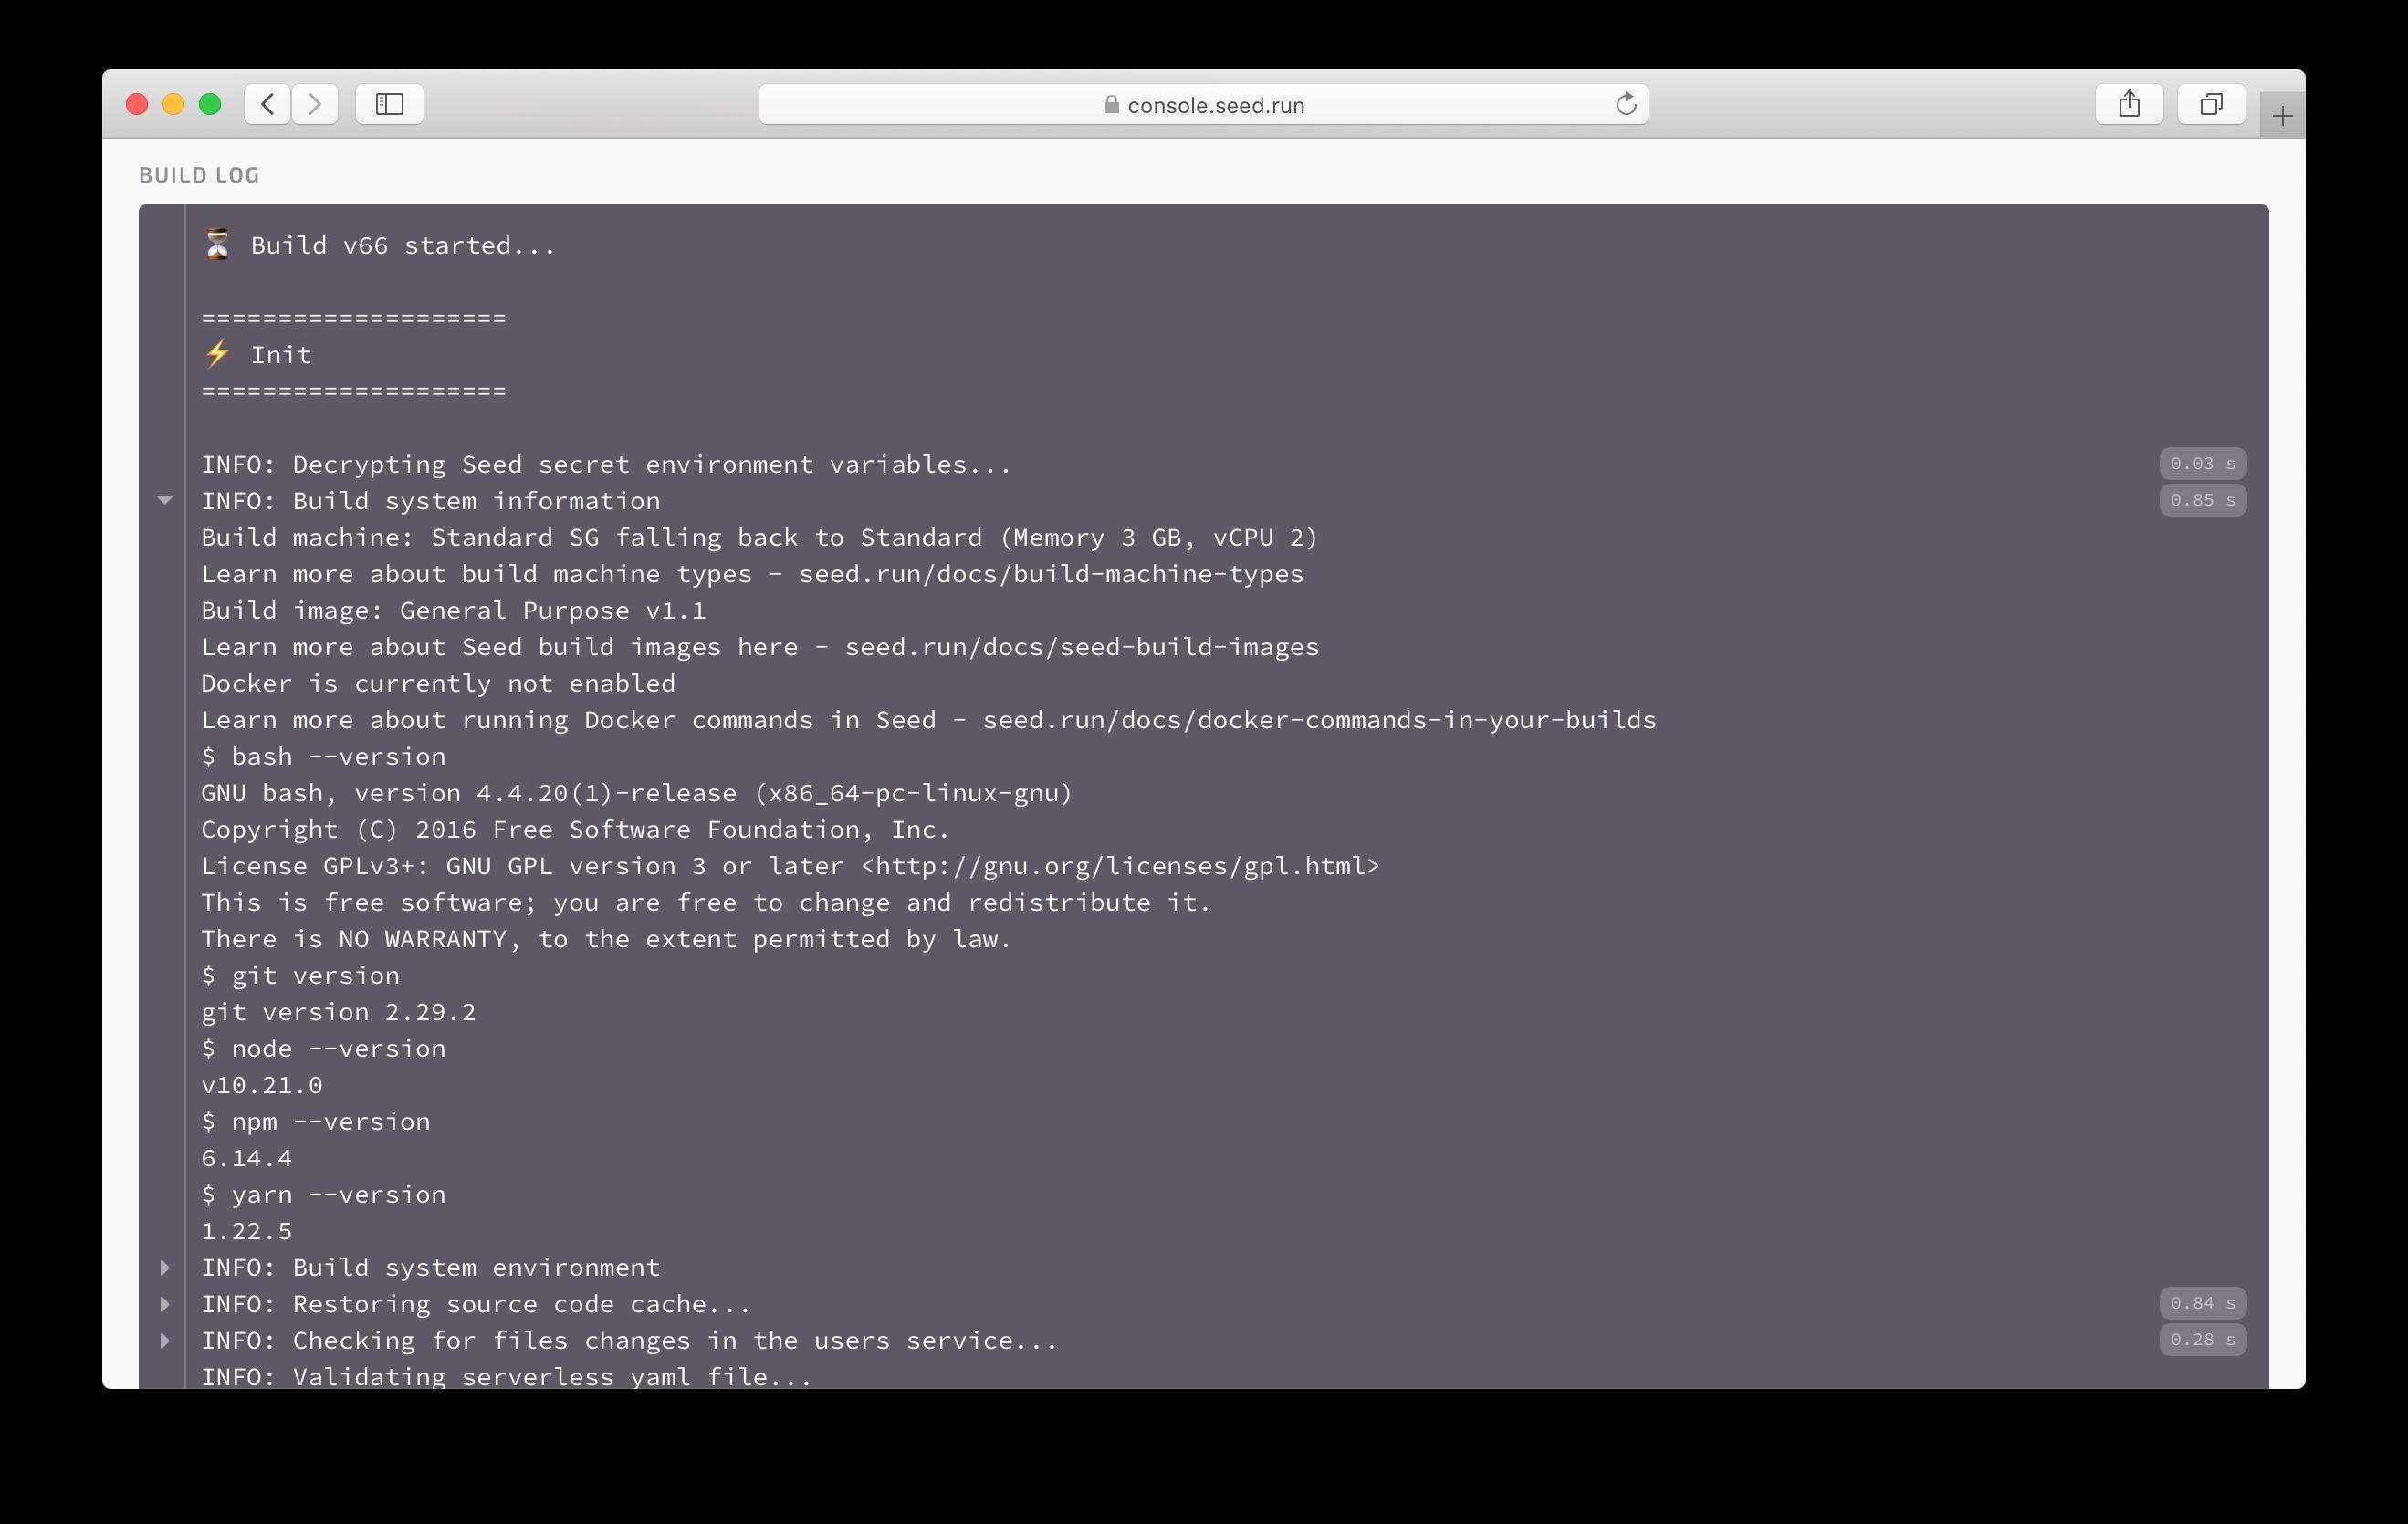 Build machine fallback info in build log